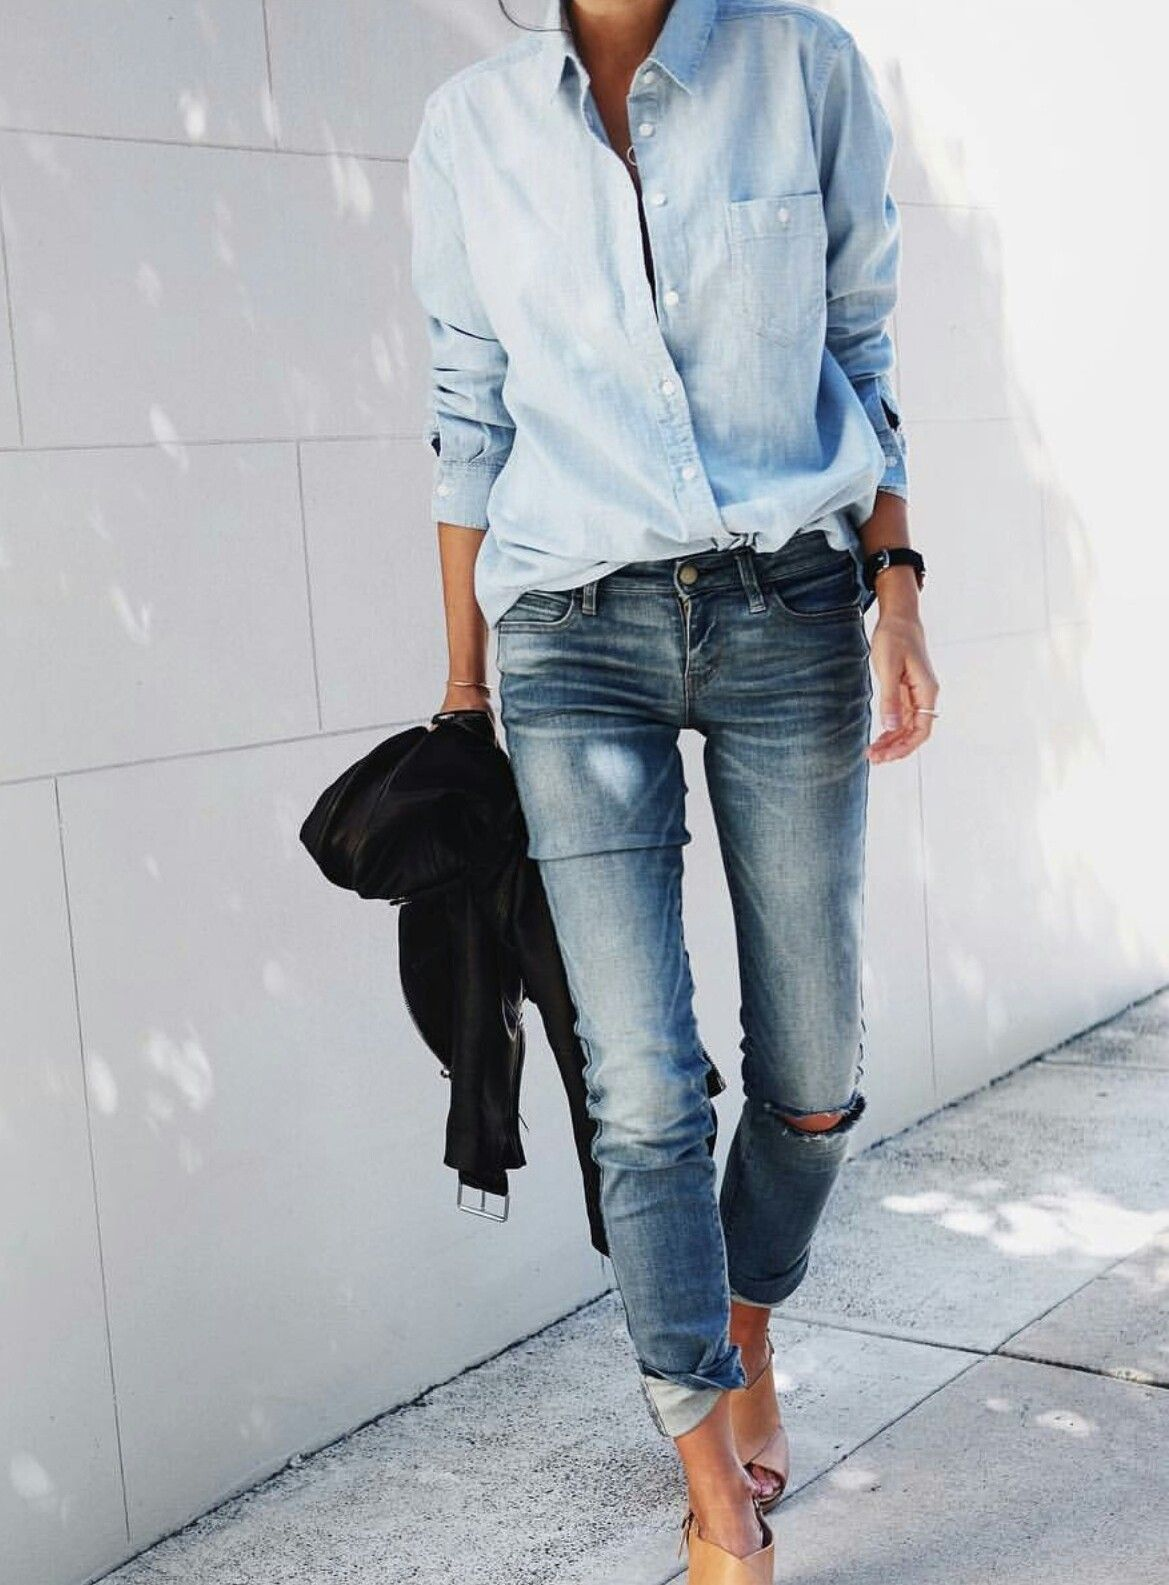 bafa2a3bd3e2 c a s u a l   Denim Shirt Outfit Summer